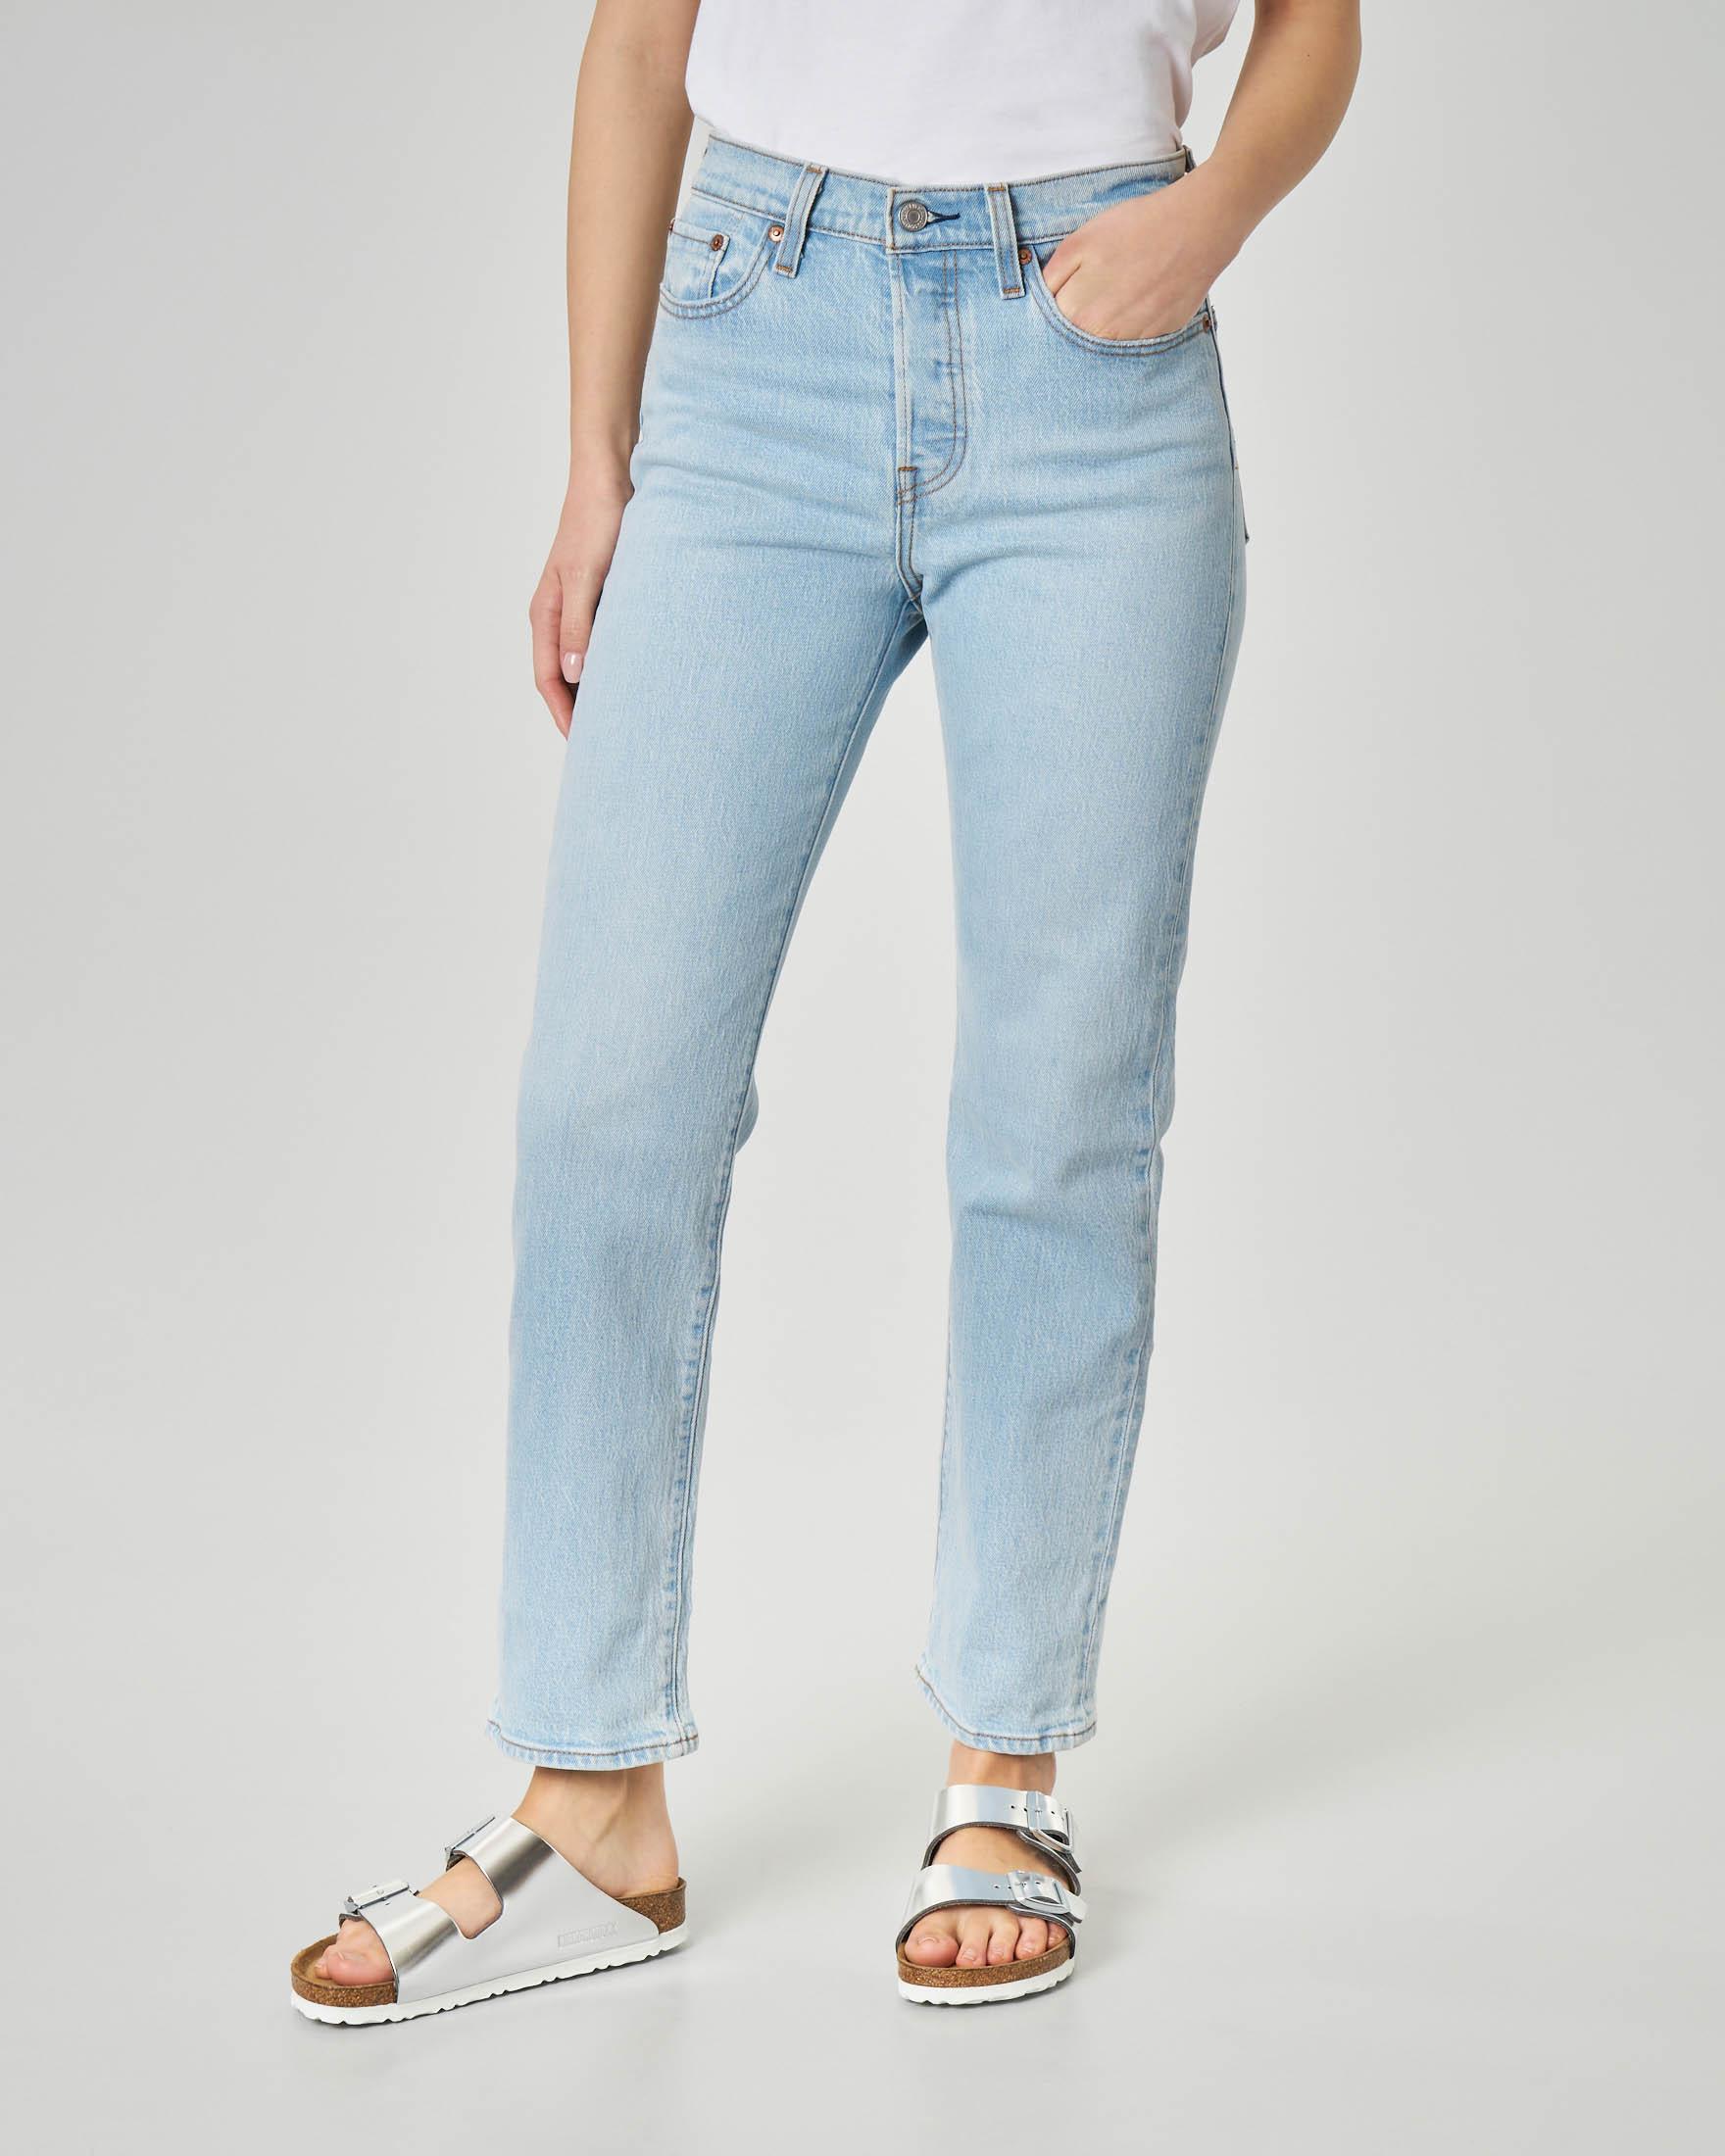 Jeans straight blu délavé a vita media lunghezza alla caviglia